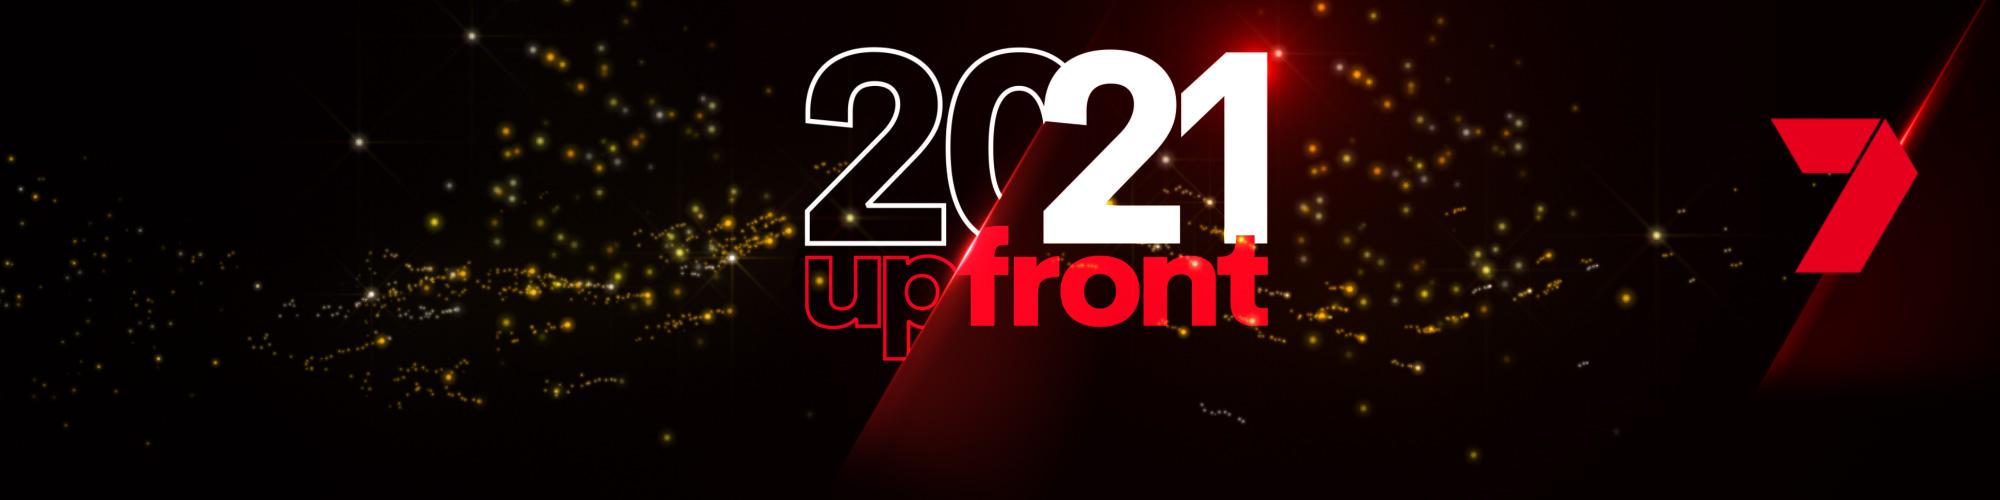 Seven's 2021 Upfront Registration